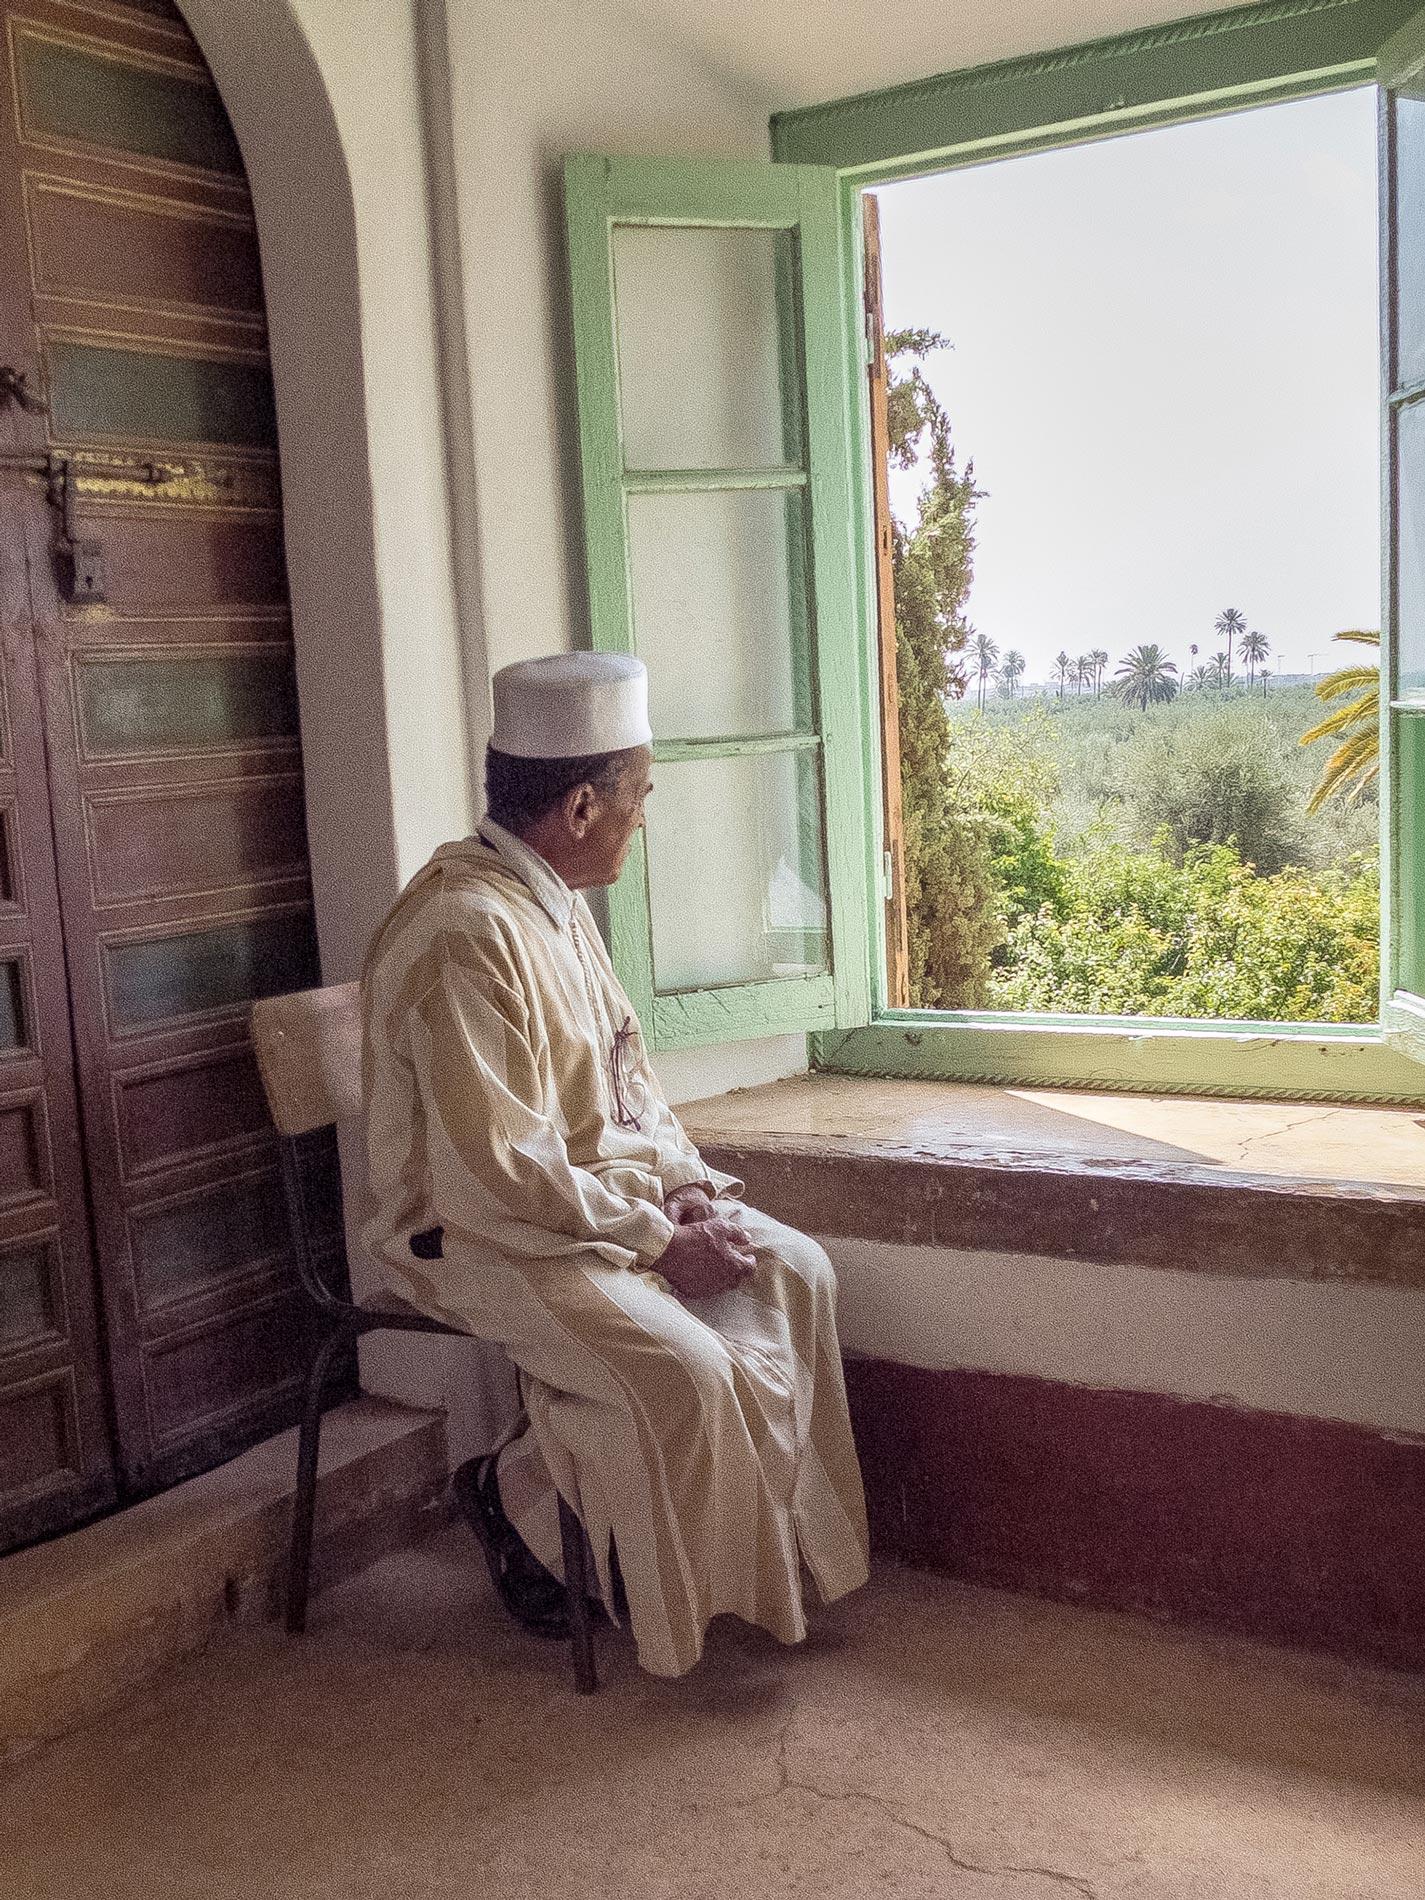 Pavillion attendant - Menara Garden, Marrakech